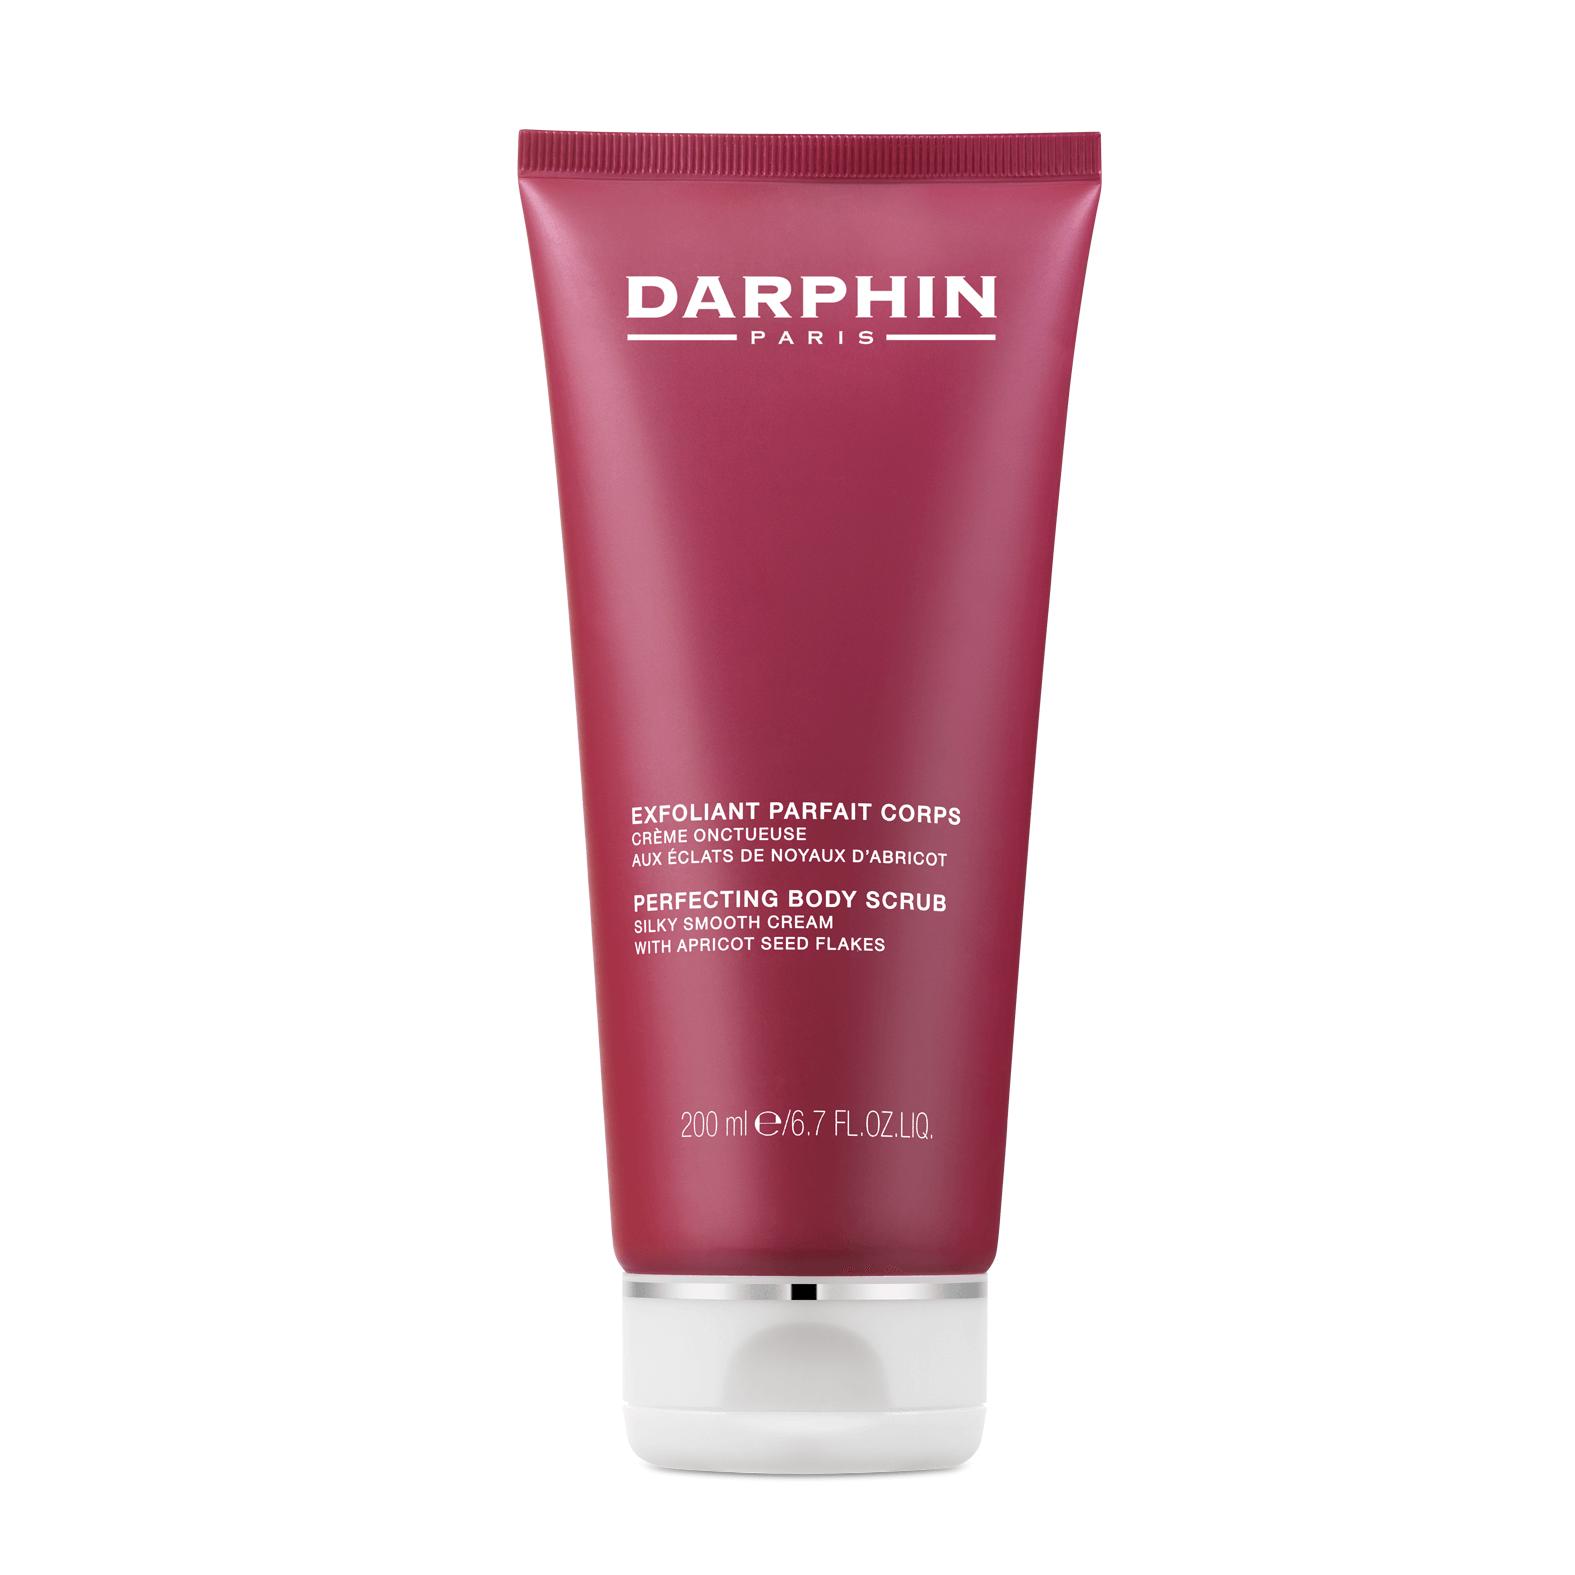 Darphin Perfecting Body Scrub Απολεπιστική Κρέμα Σώματος με Βελούδινη Κρεμώδη Υφή με Νιφάδες από Σπόρους Βερίκοκου 200ml